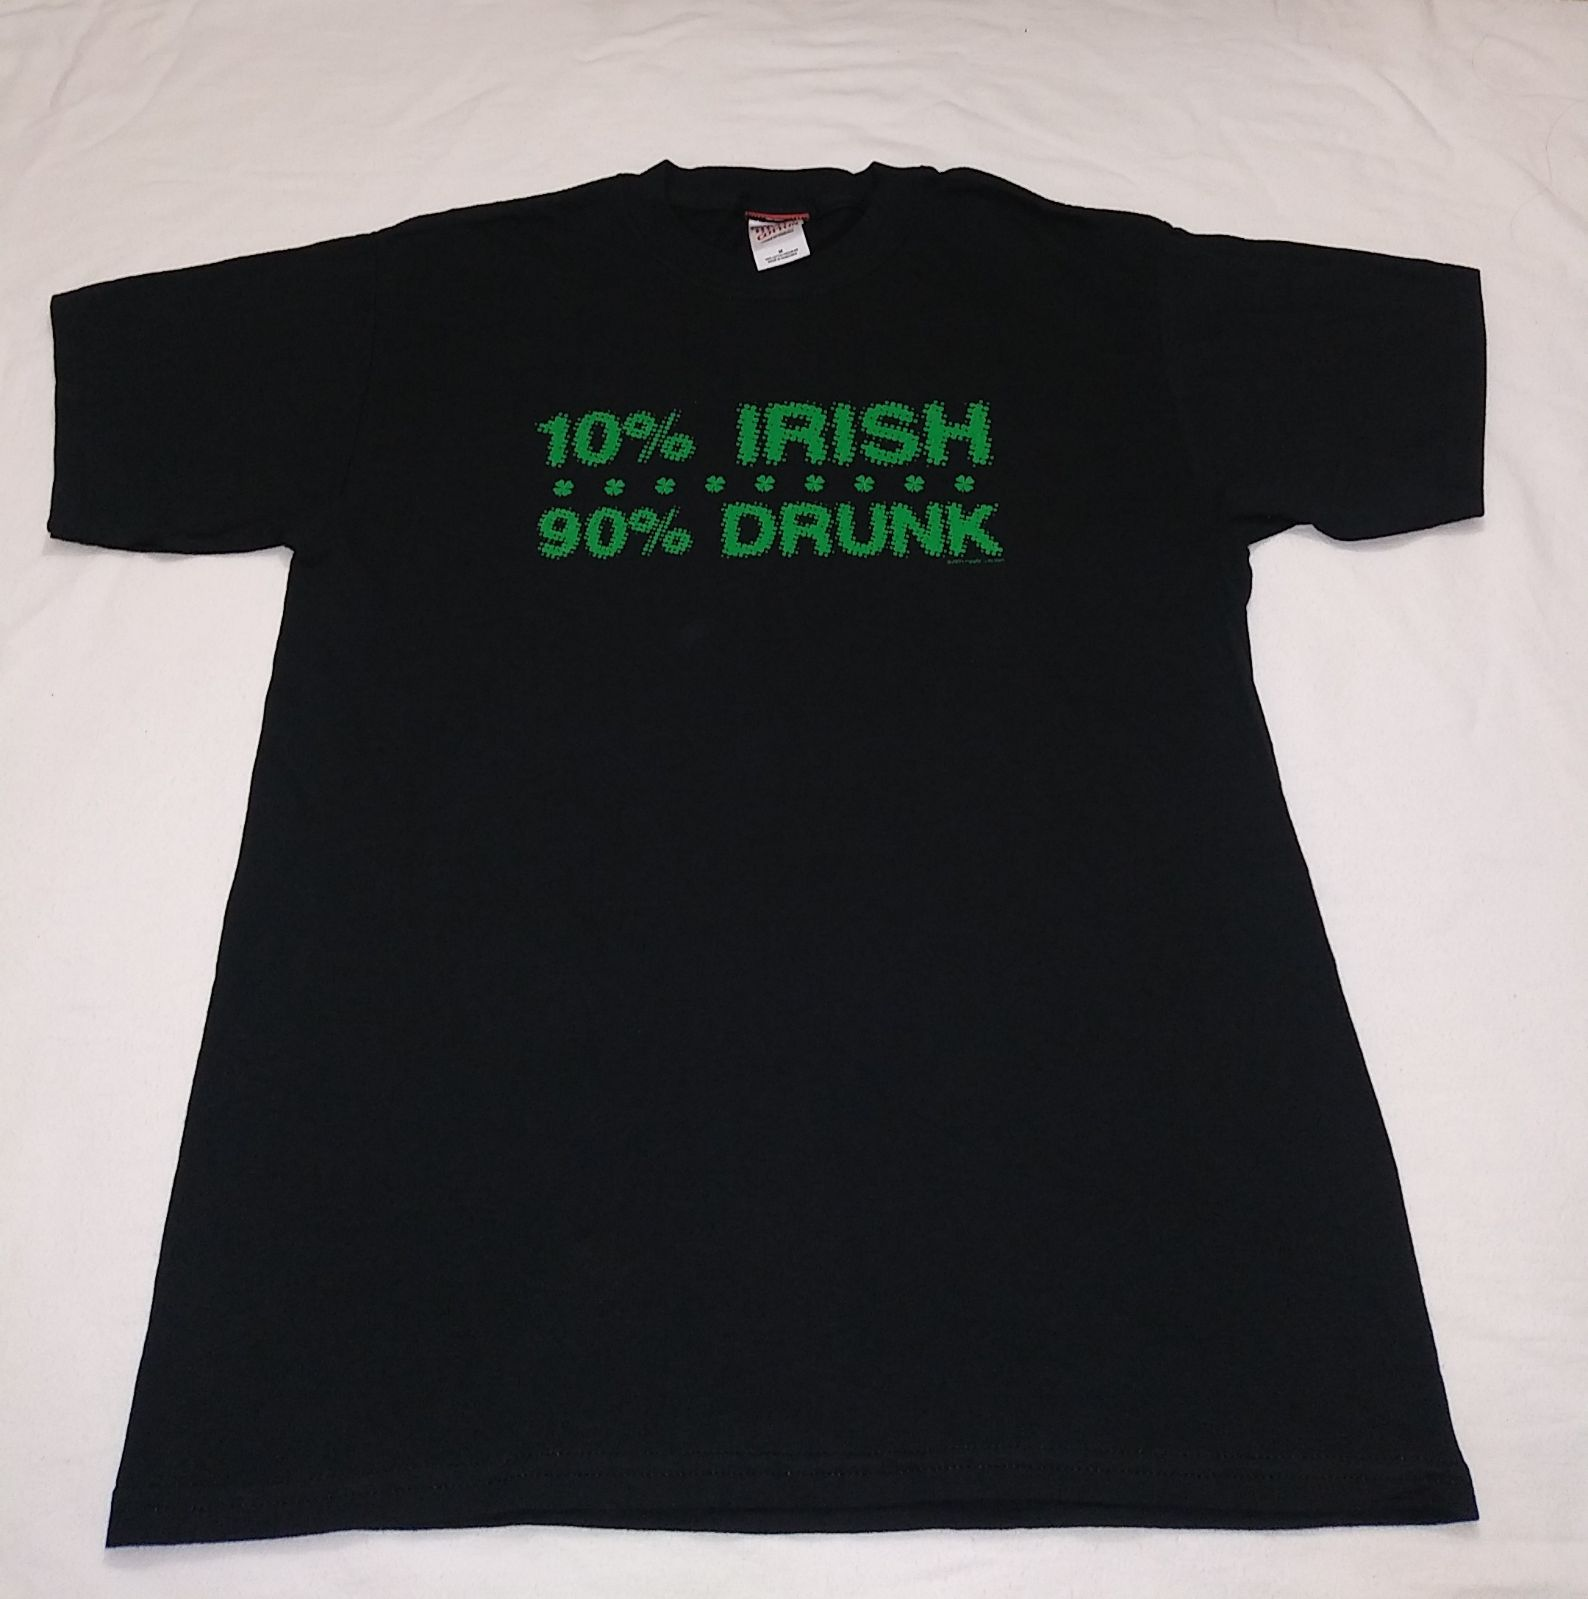 Funny t-shirt by Gildan